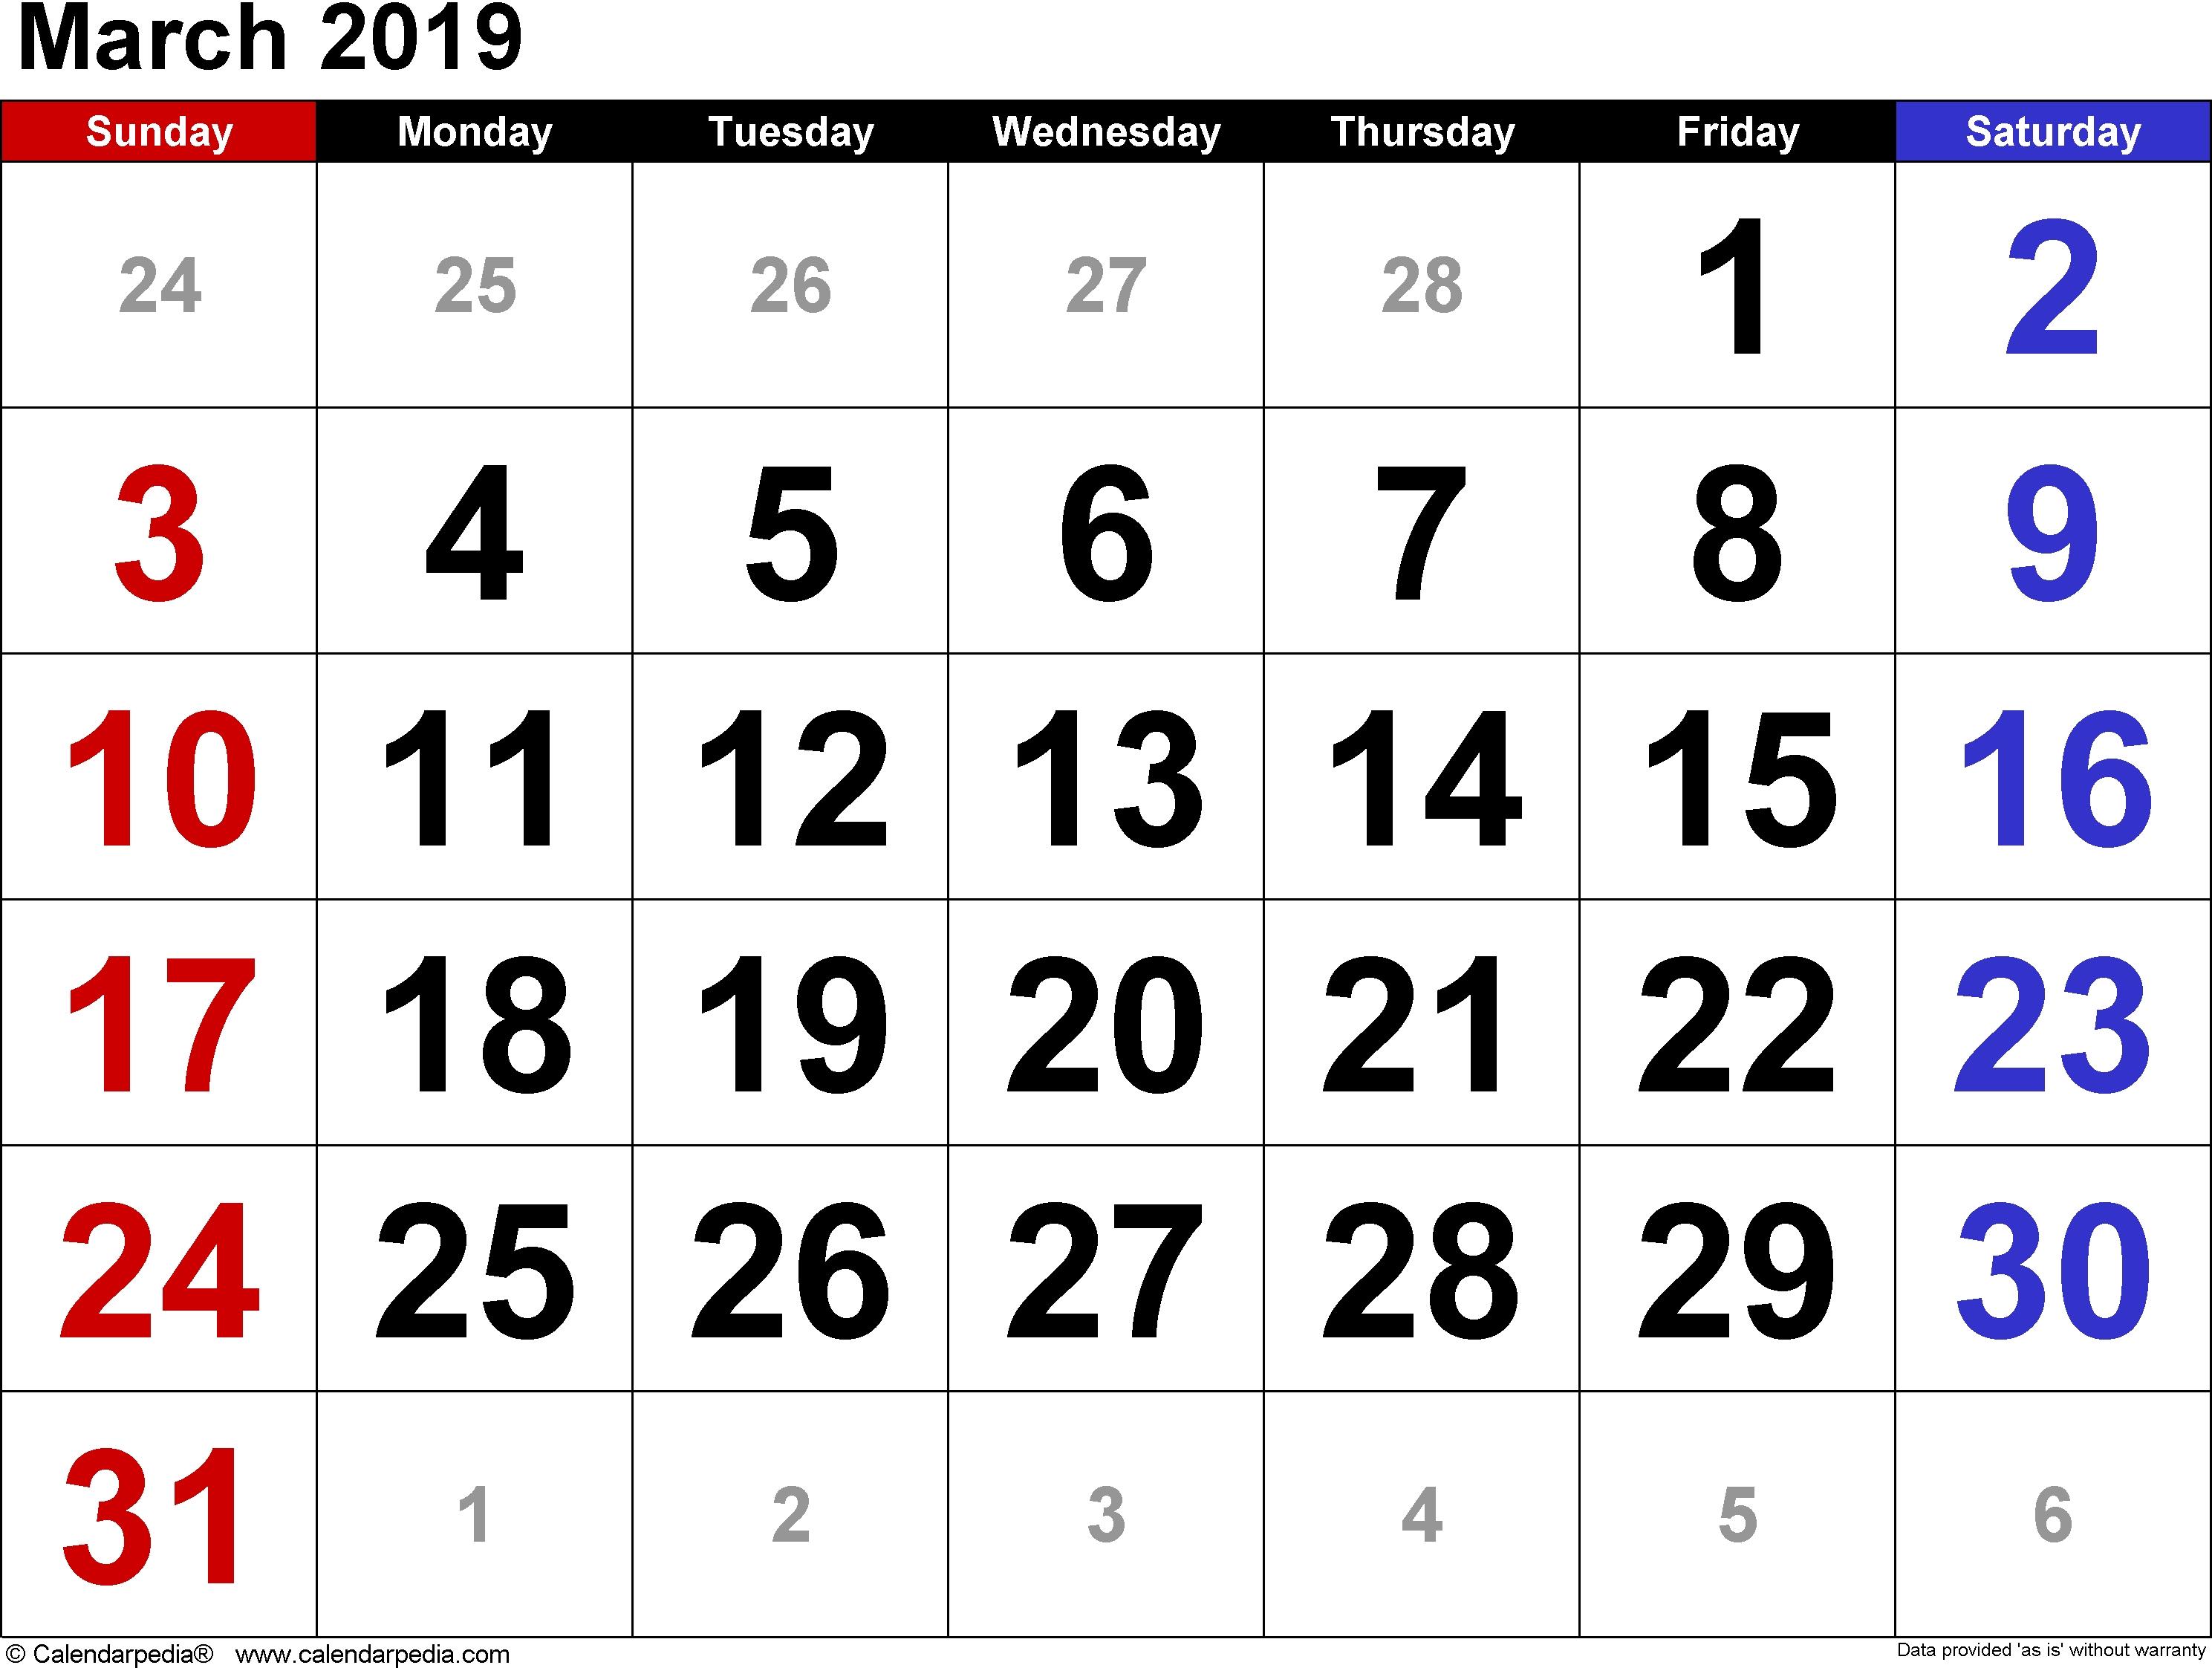 Get Free Template March 2019 A4 Calendar – Free Calendar And Holidays March 9 2019 Calendar